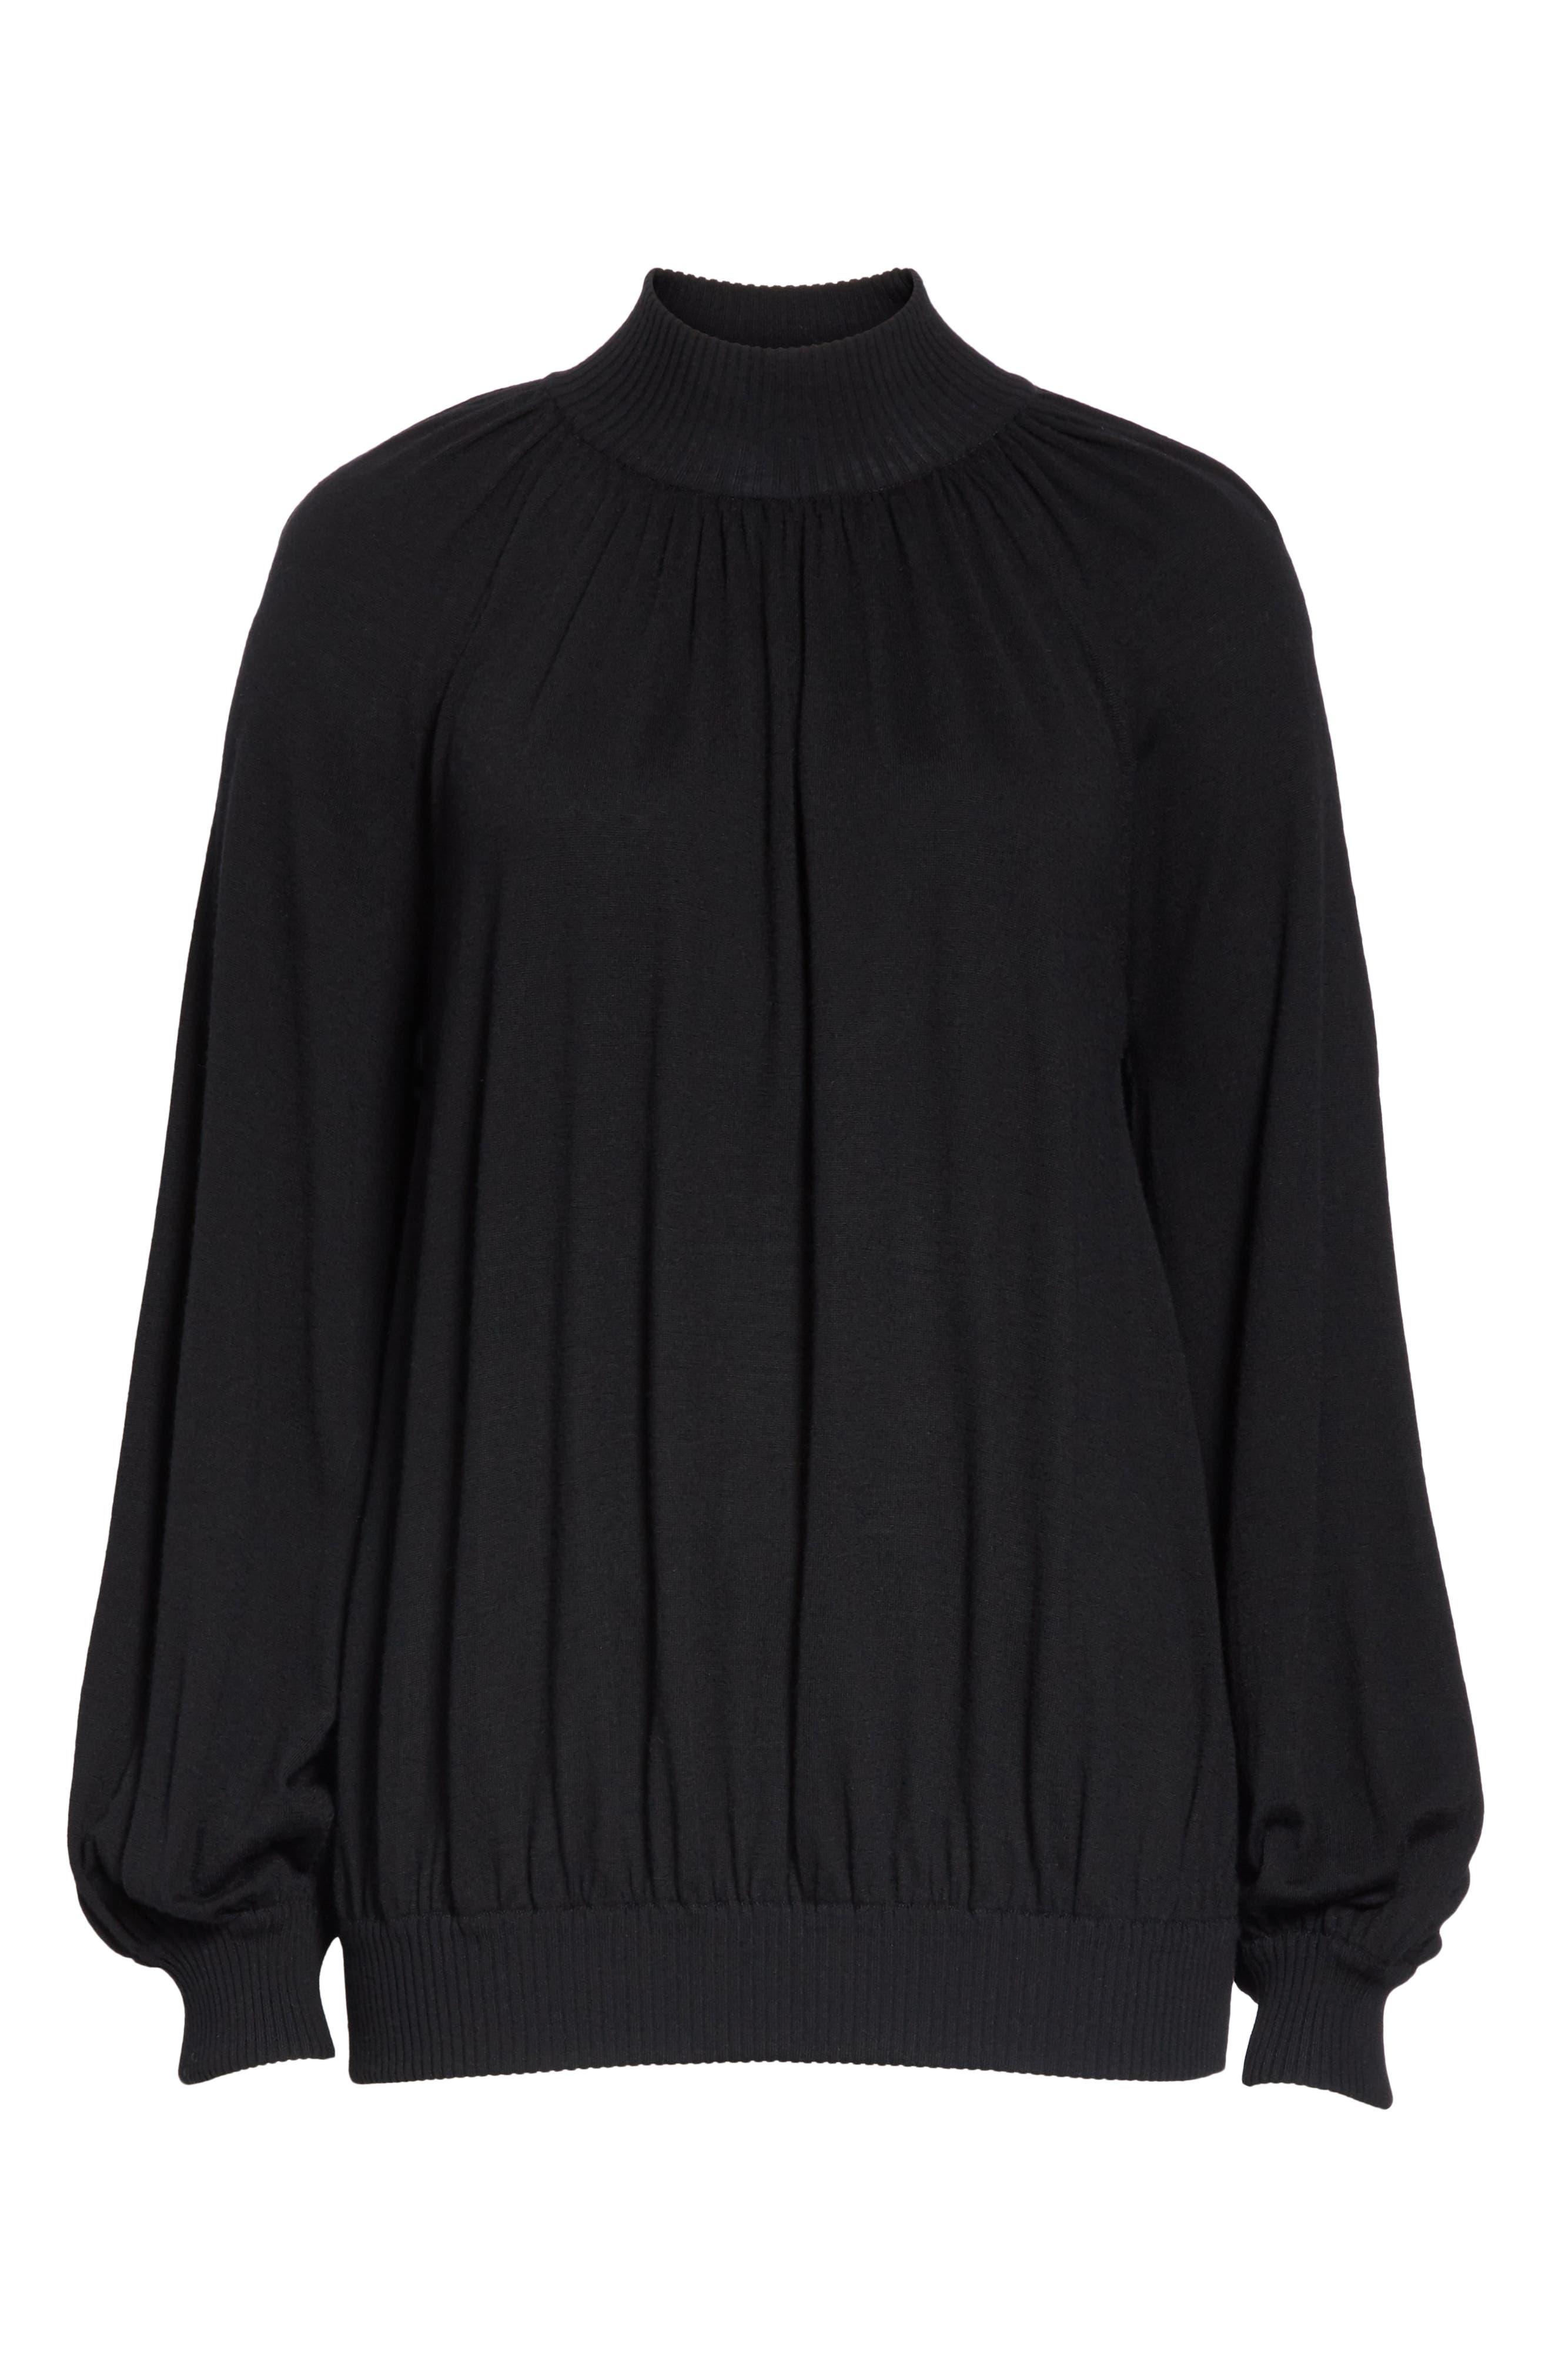 CO, Cashmere High Neck Blouson Sweater, Alternate thumbnail 6, color, BLACK